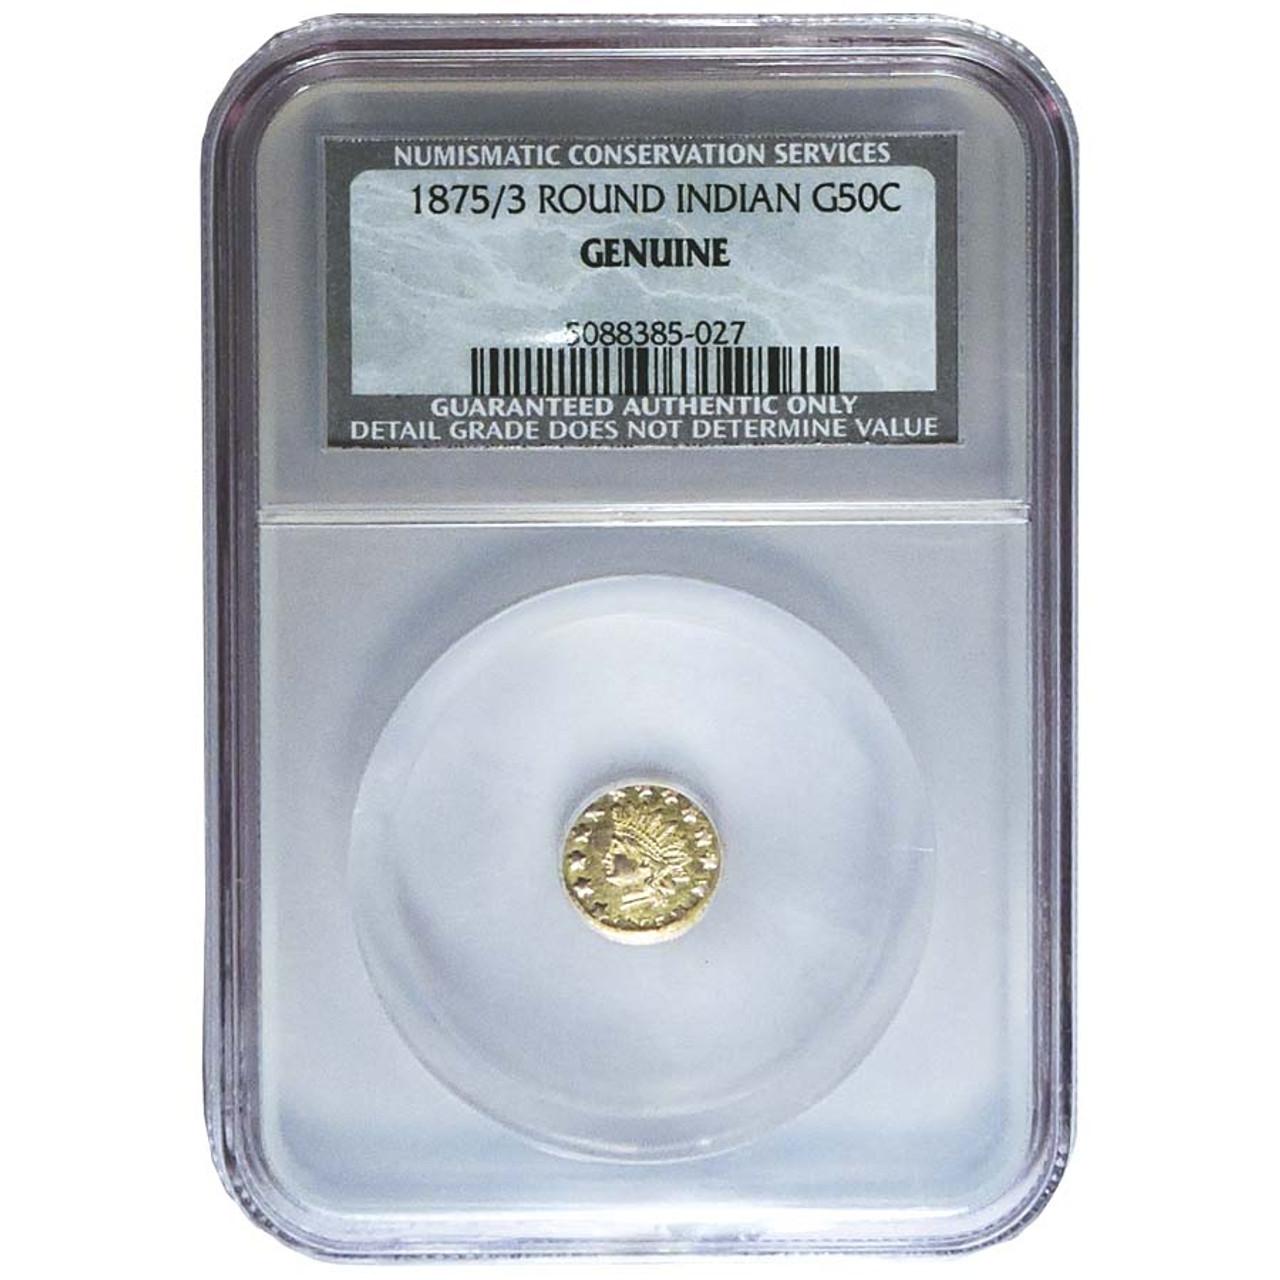 1852-1875 Fractional Round Half Dollar Gold, NCS Certified Genuine